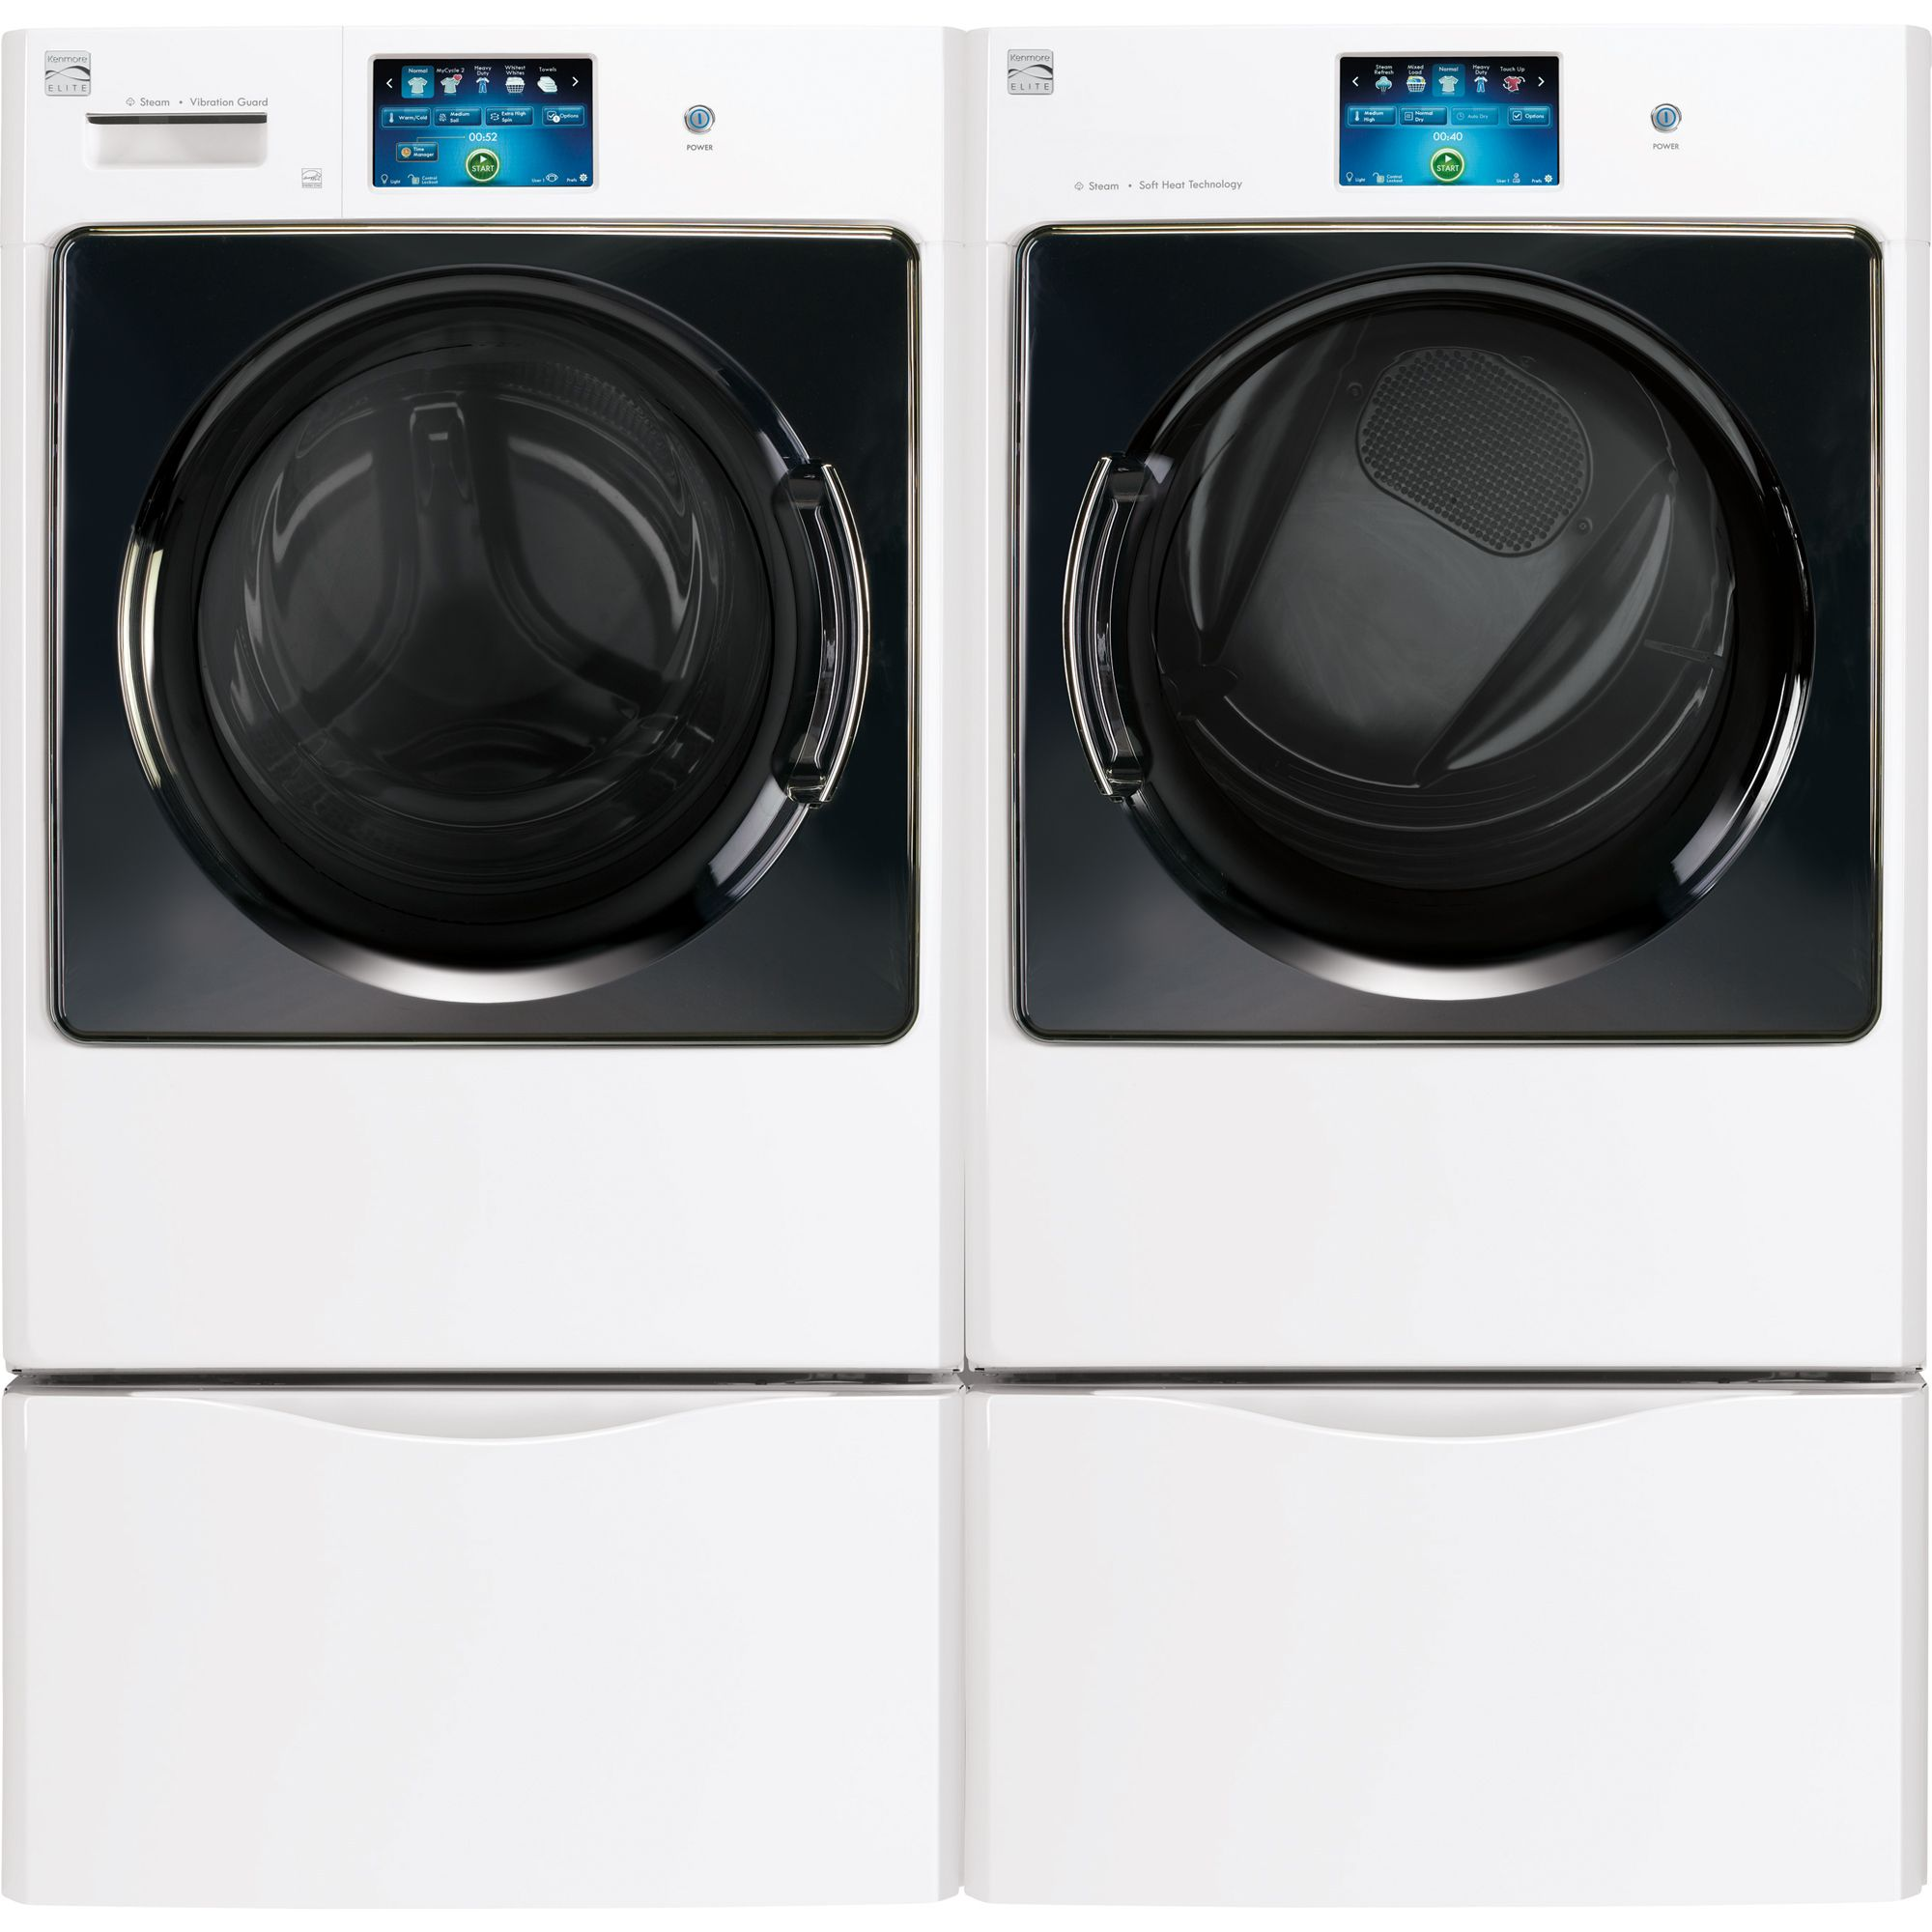 Kenmore Elite 8.0 cu. ft. Steam Gas Dryer